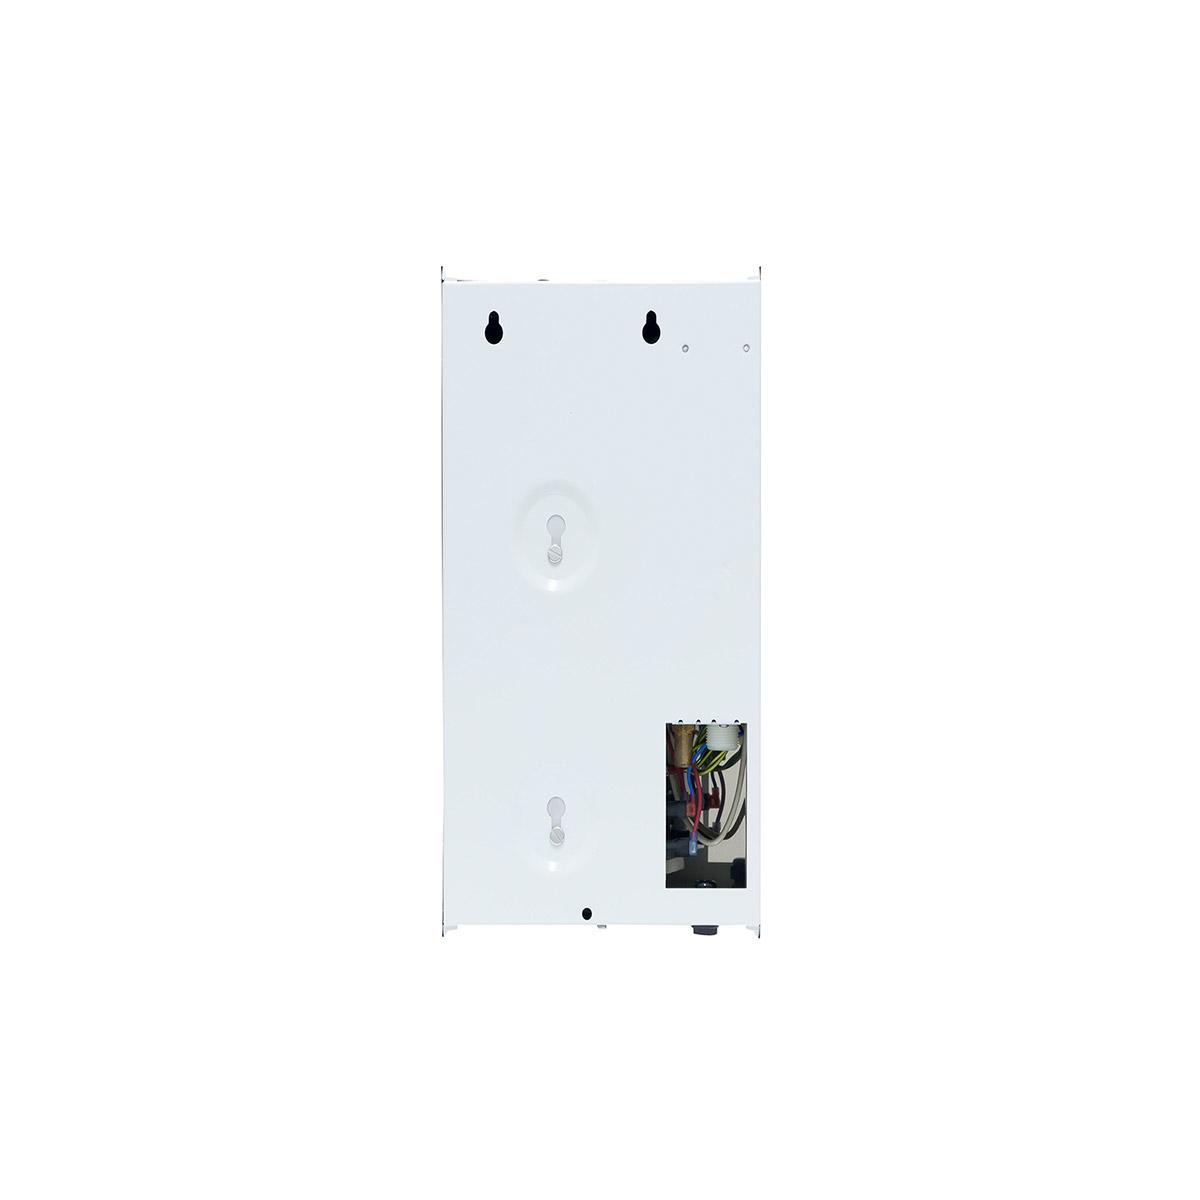 Instanta Sureflow Wall Mounted Water Boiler WMS2 Mirror Finish 2.5Ltr